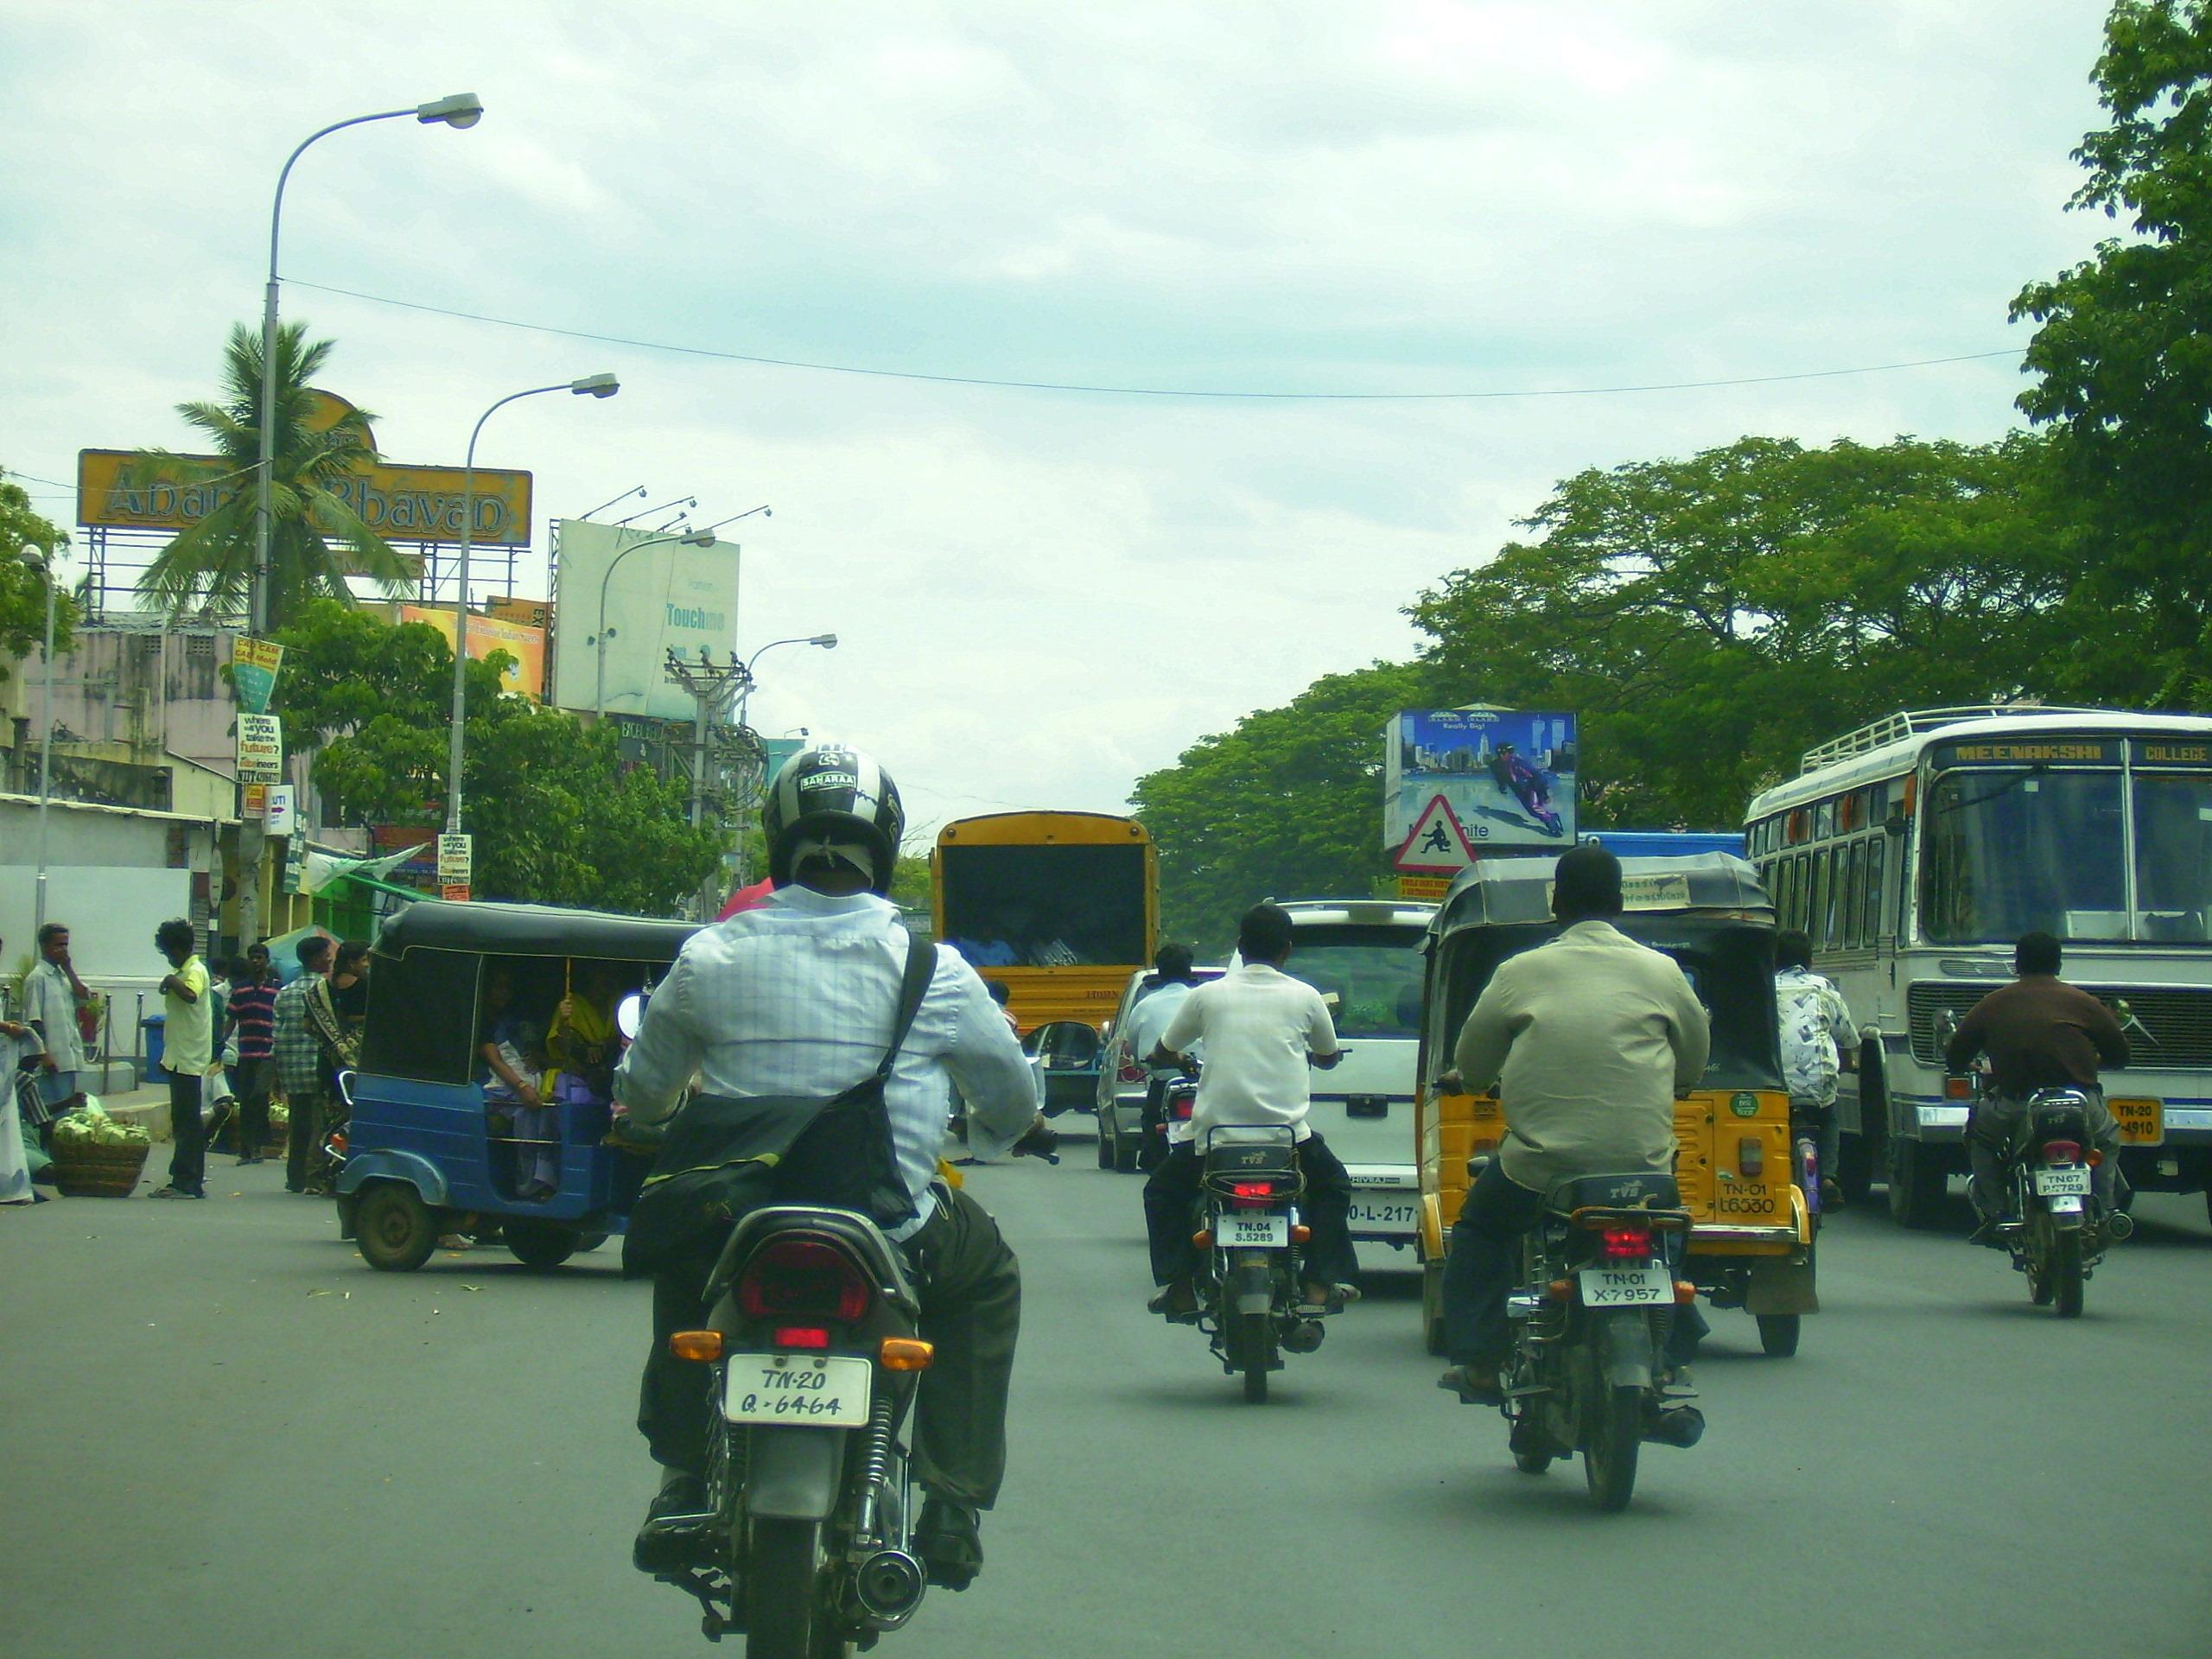 chennai traffic Chennai traffic reports, road conditions chennai, traffic jam get traffic info for your regular route - here wego.